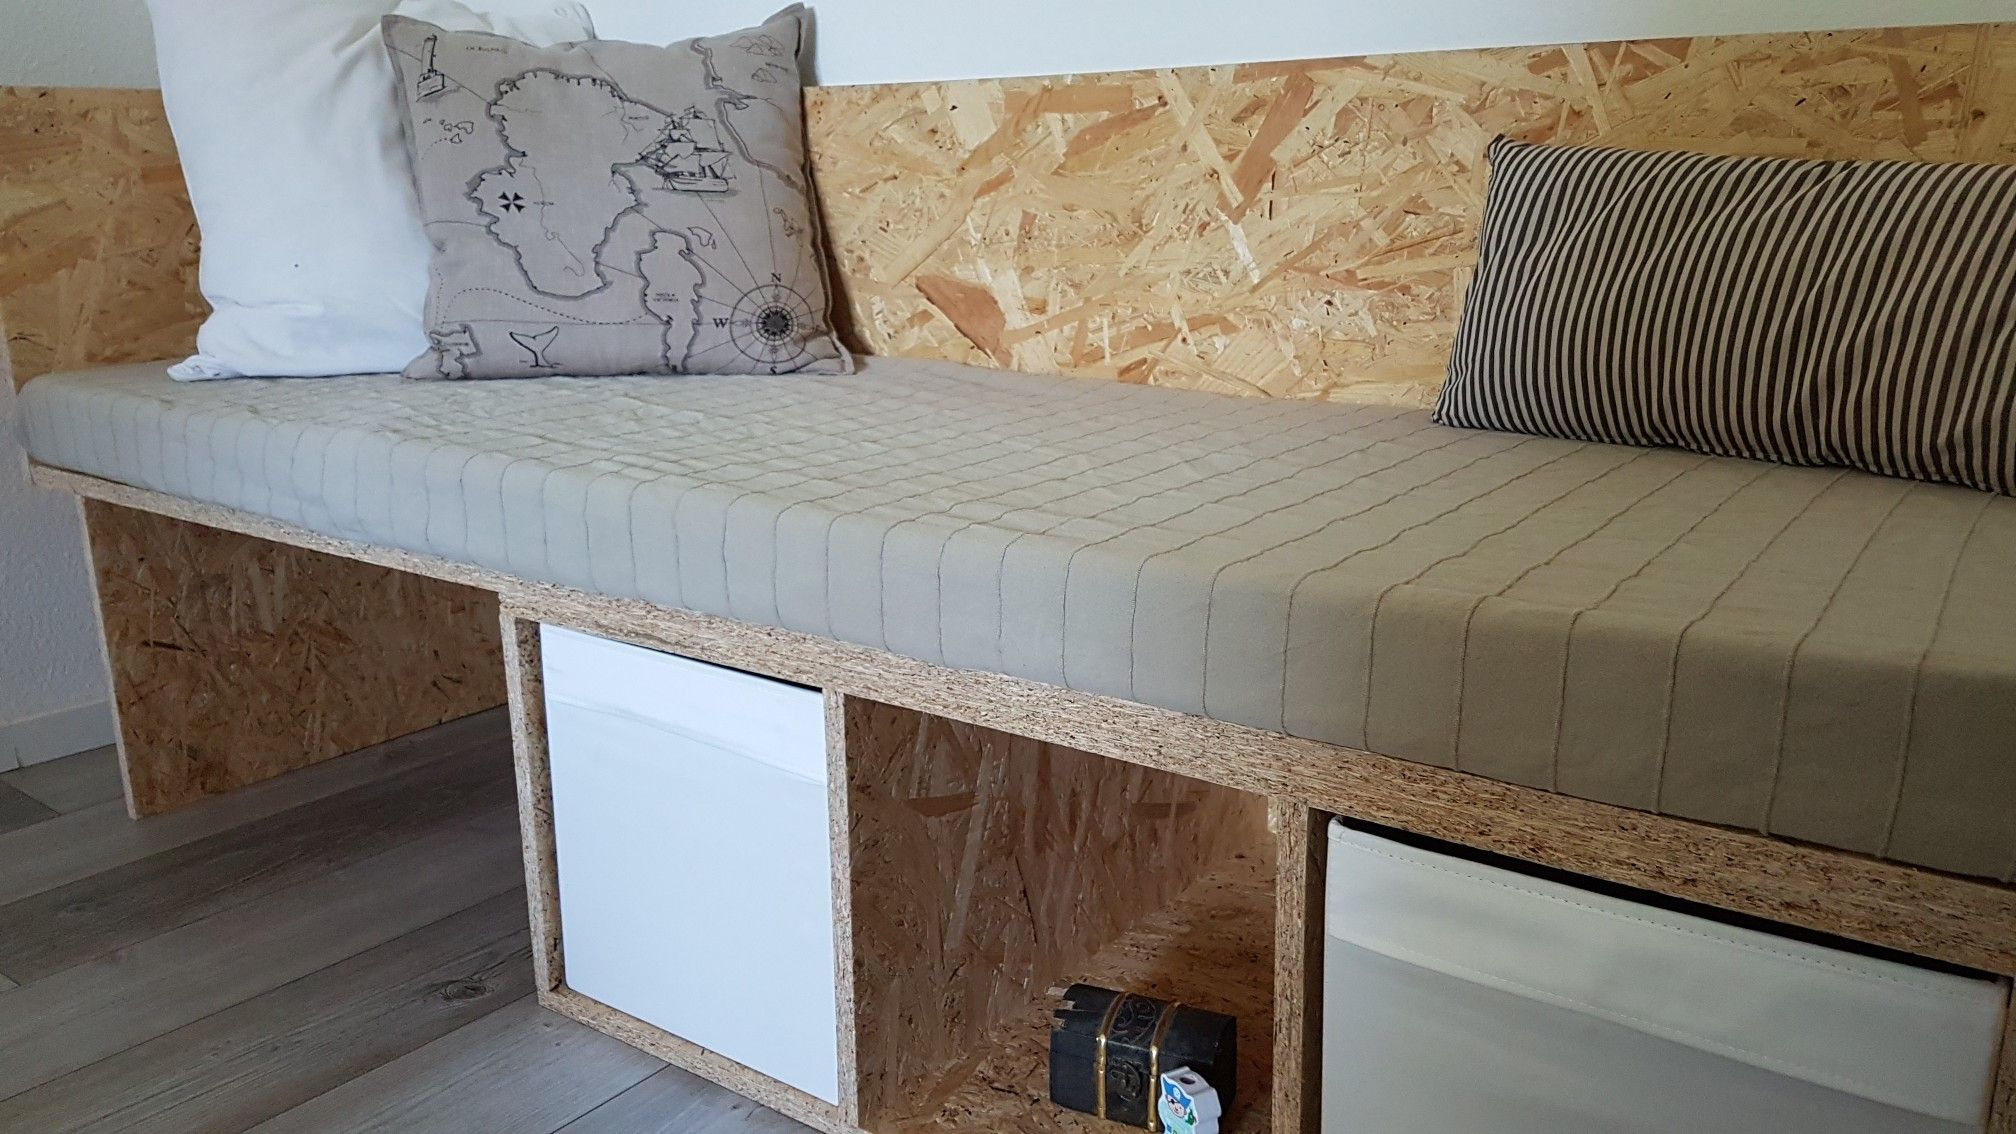 Raumpirateriede Poofen Möbel Selber Bauen Bett Selber Bauen